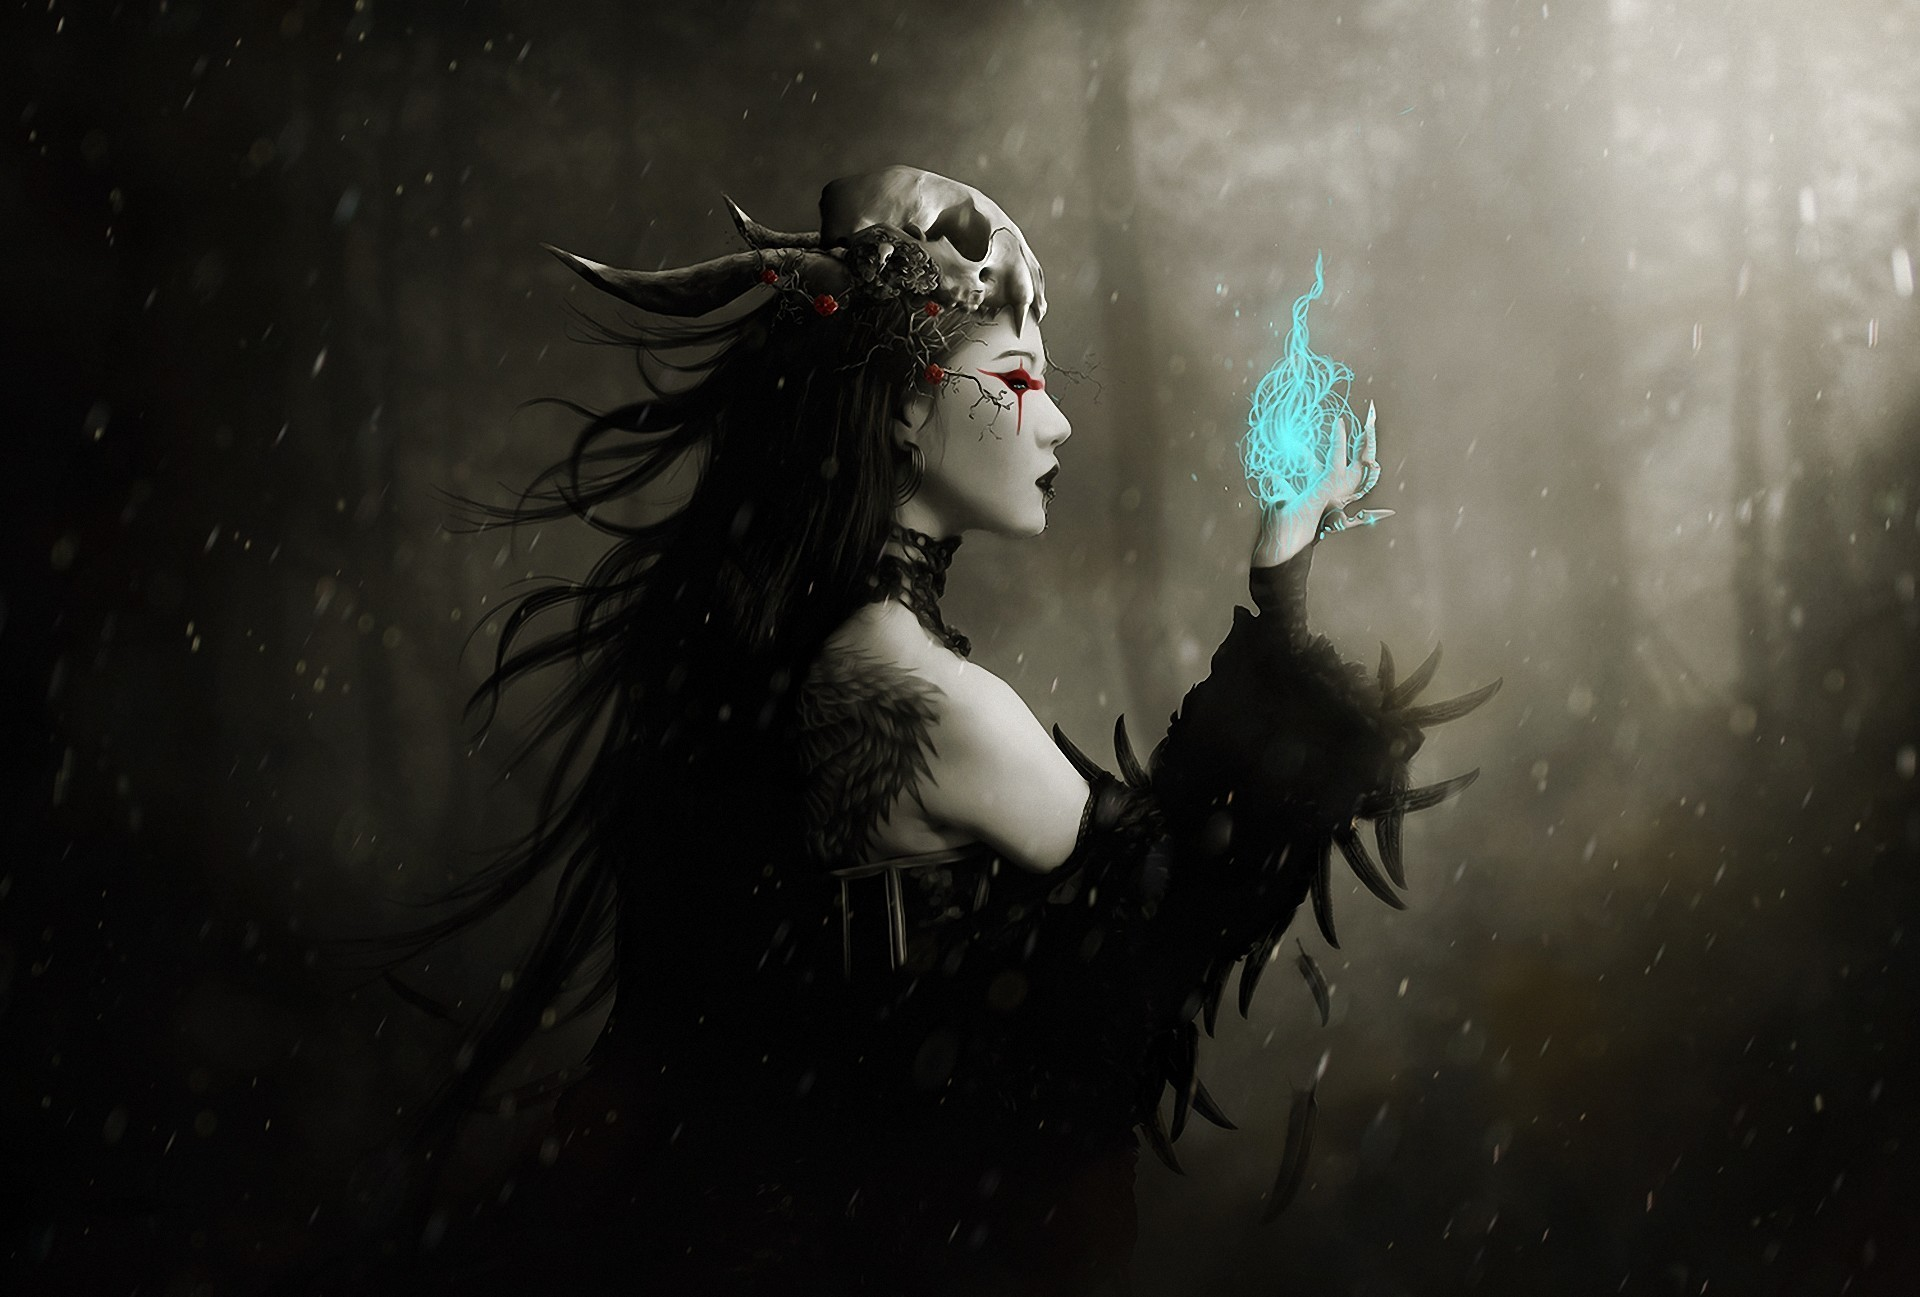 Fantasy women evil - photo#17